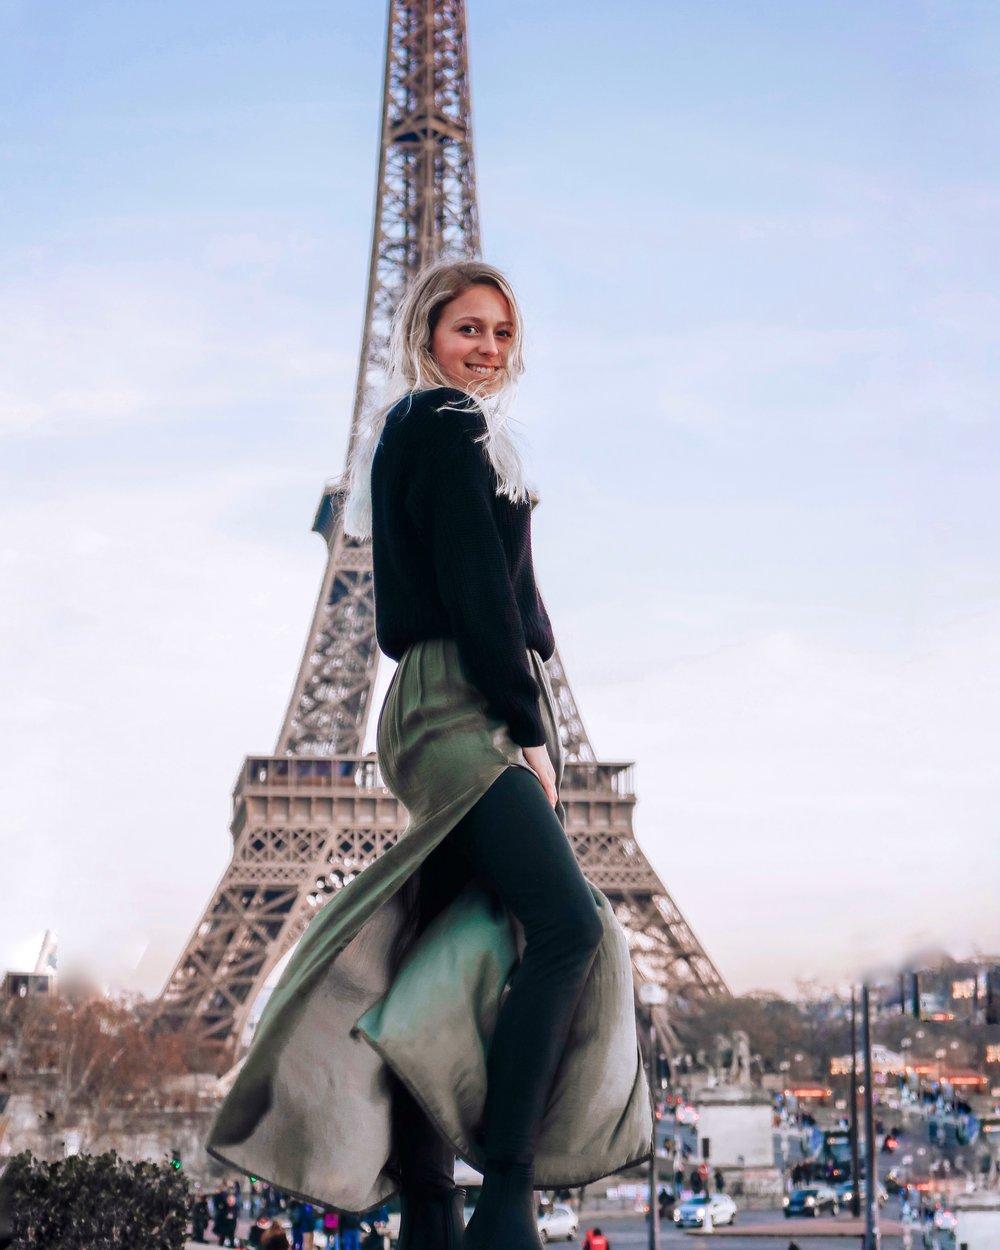 Kessler Ramirez – Eiffel Tower in Paris, France